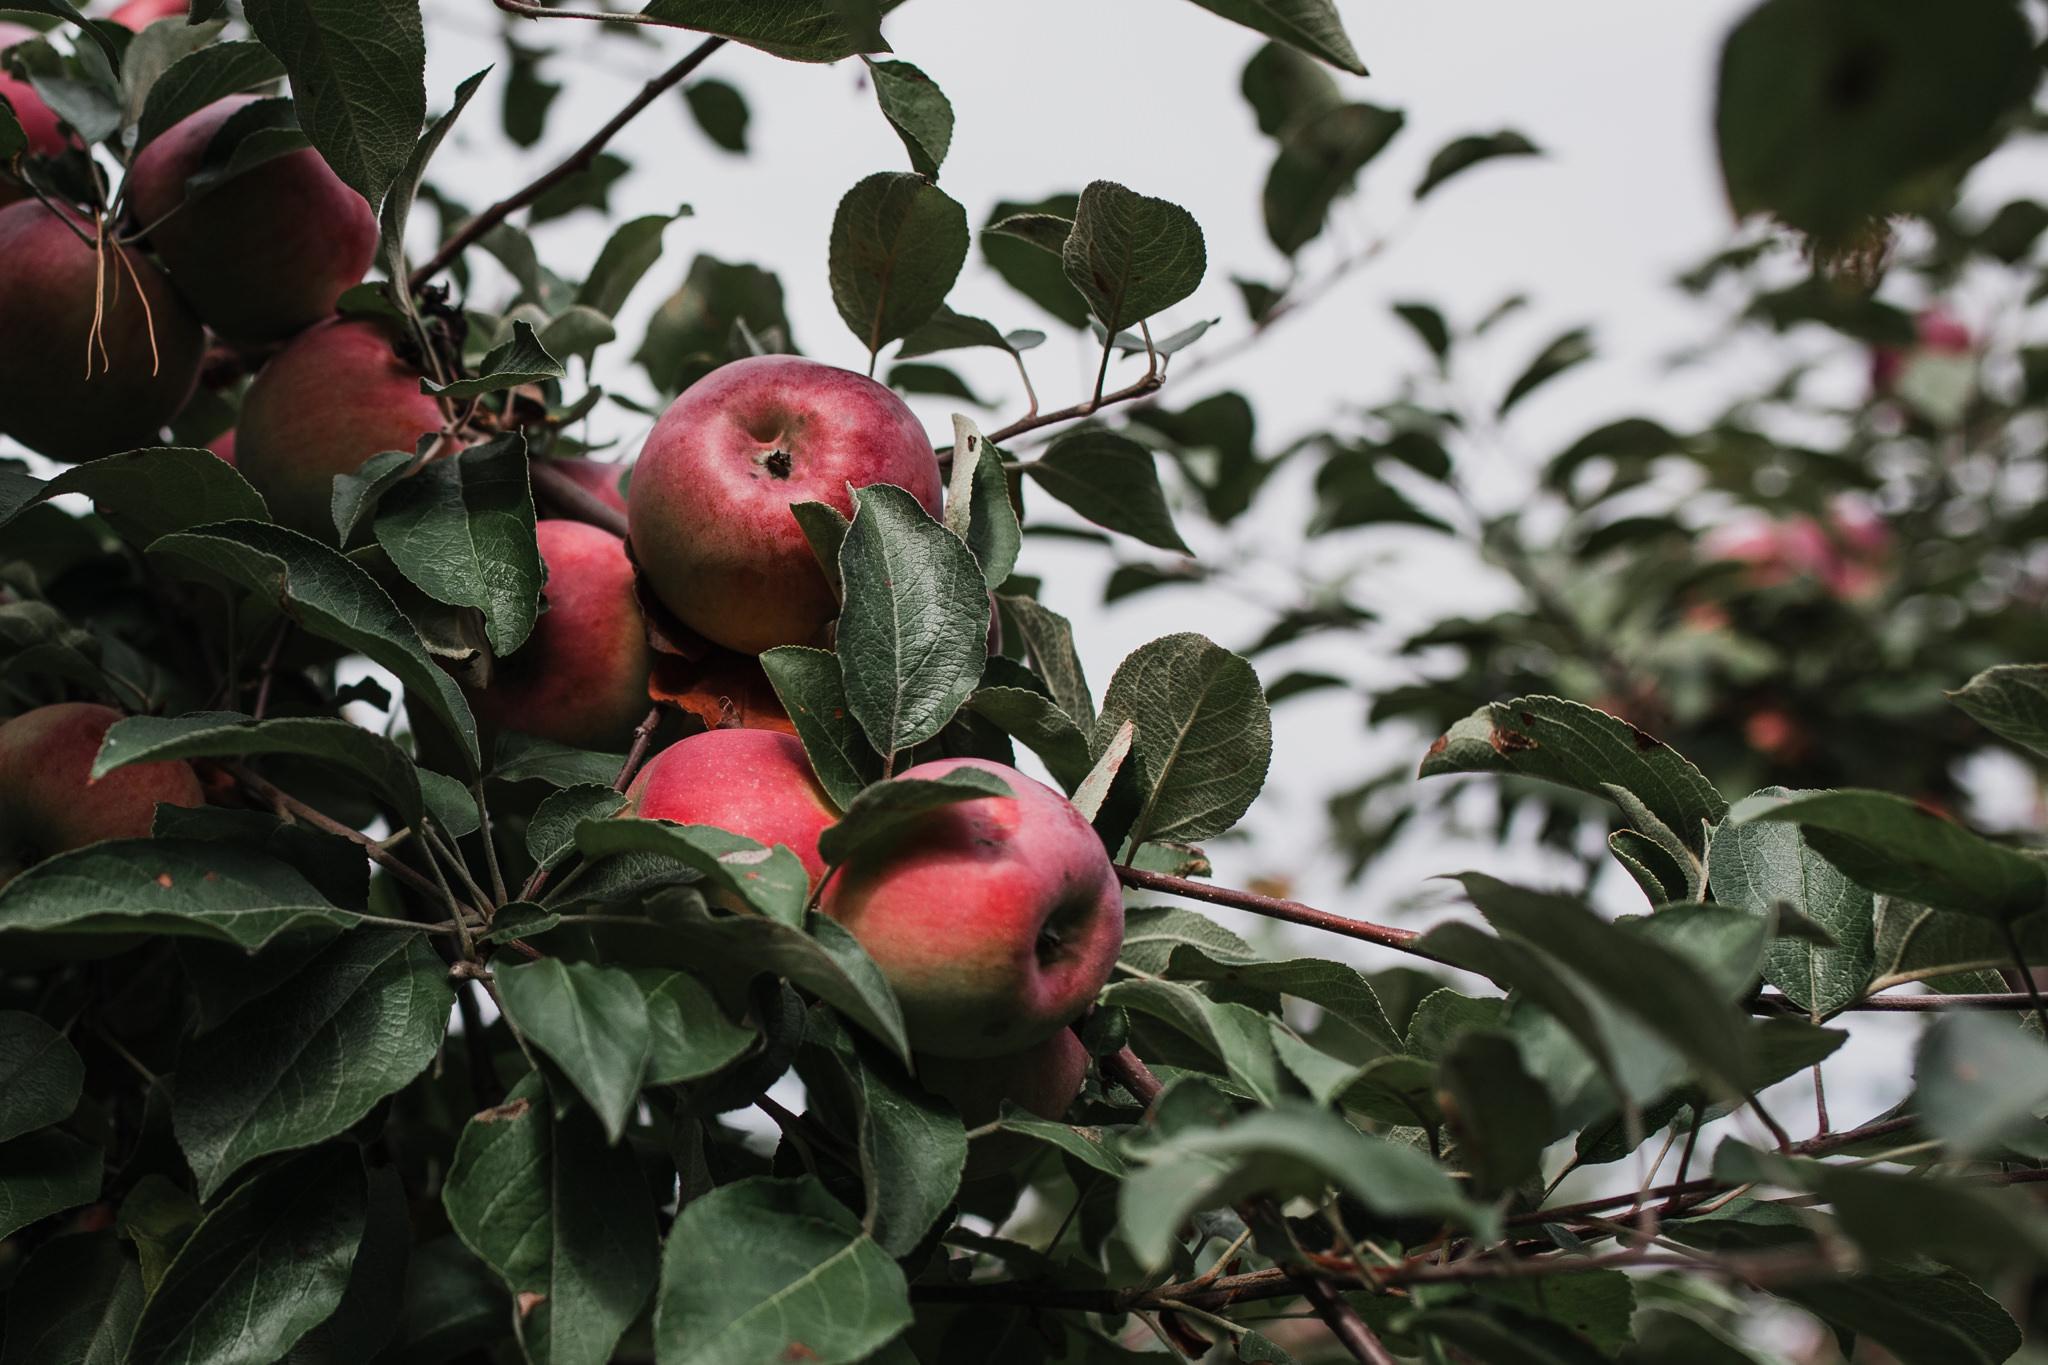 059-WEB-Jonathan-Kuhn-Photography-Elish-Nate-AppleOrchard-6760.jpg